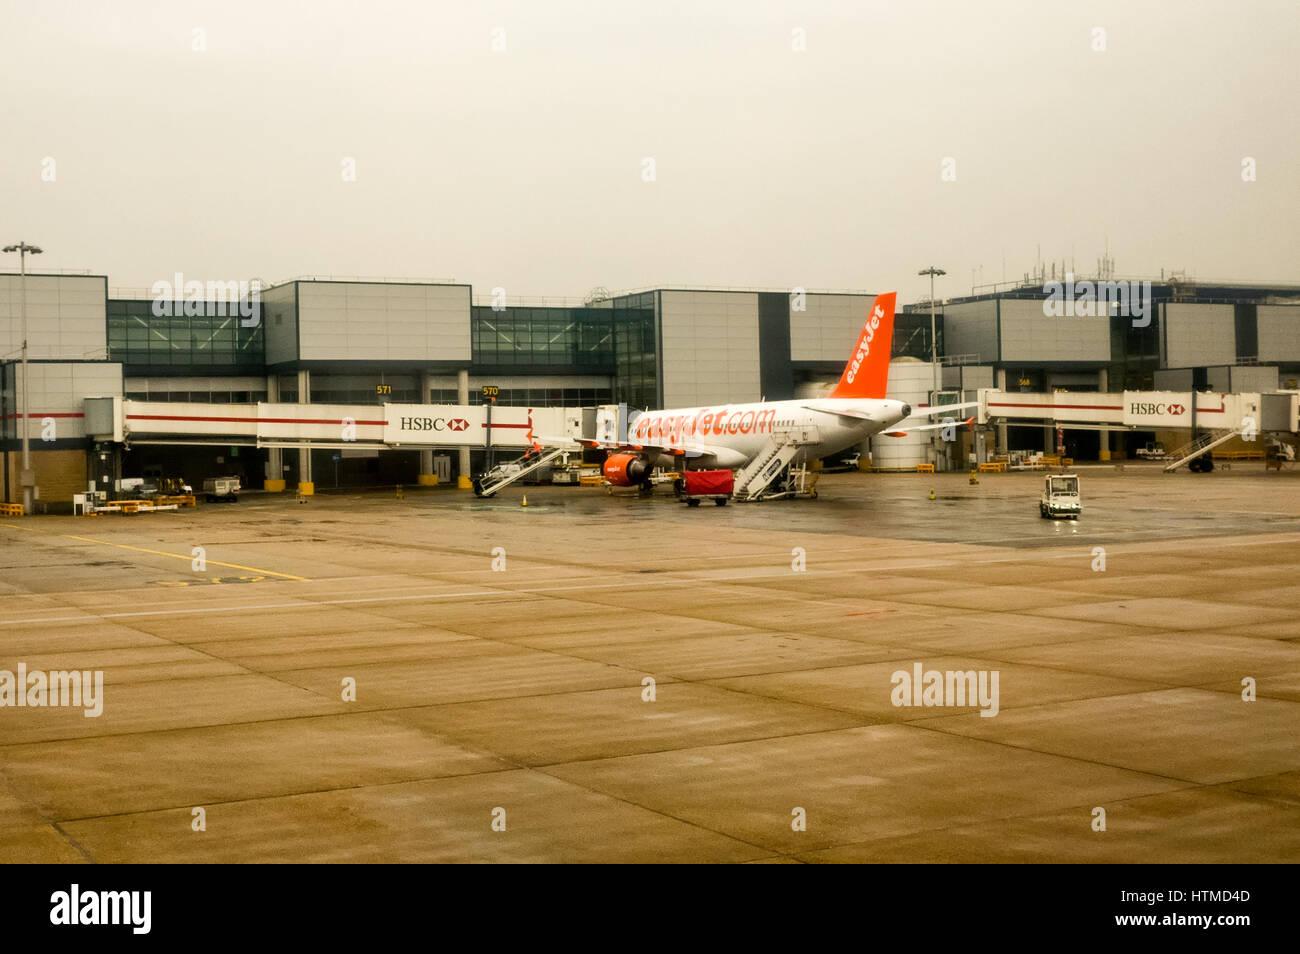 London Gatwick. England UK. EasyJet planes on London Gatwick airport runway preparing for take off. - Stock Image